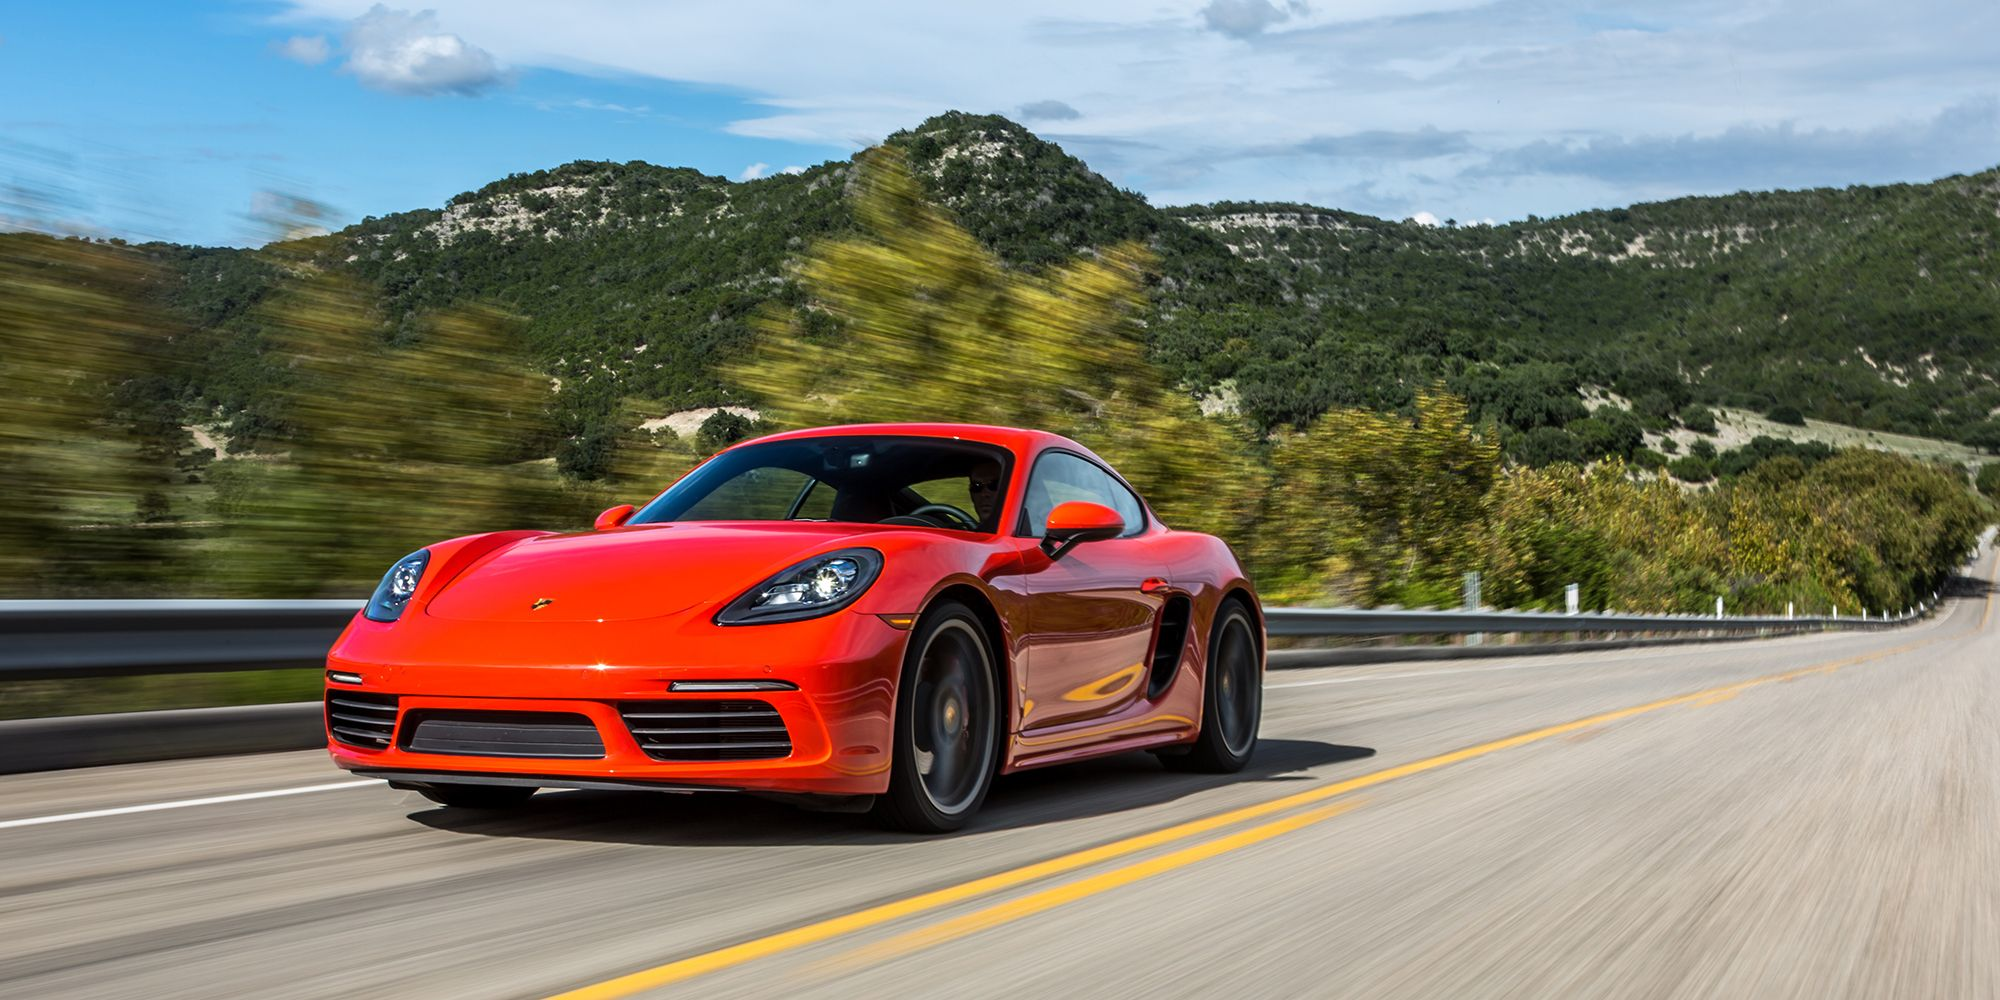 18 Best Cars Under 100 000 Best Sports Cars Under 100k In 2018